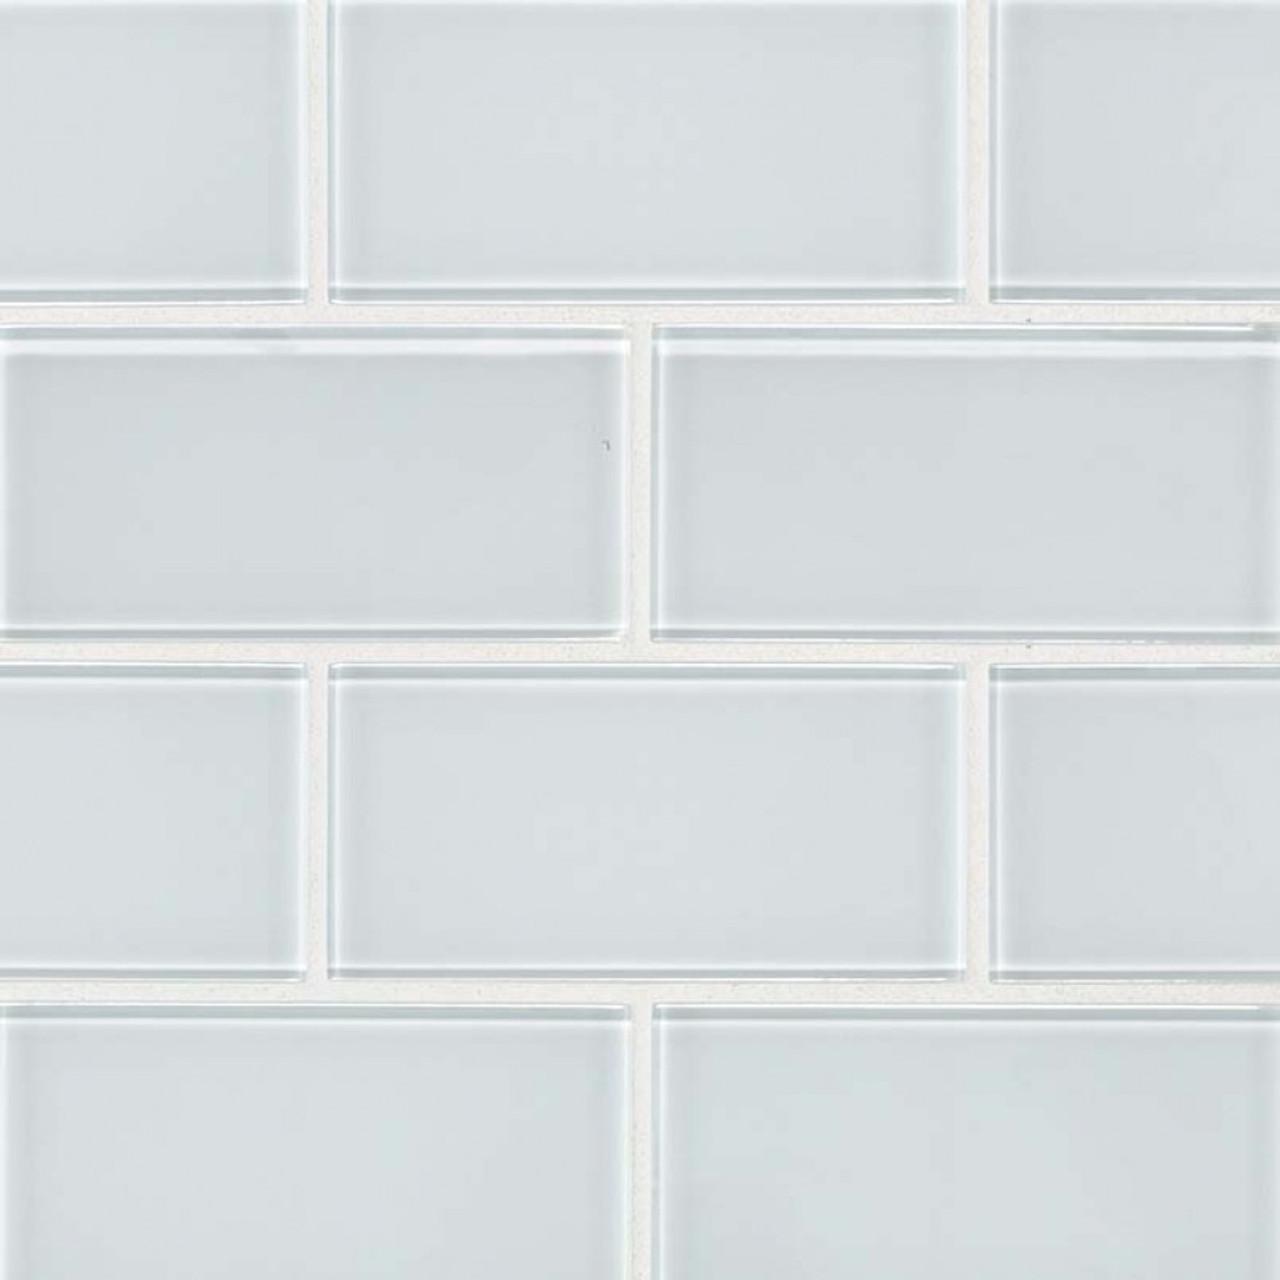 ms international backsplash series ice white 3x6 glass subway tile smot gl t ic36